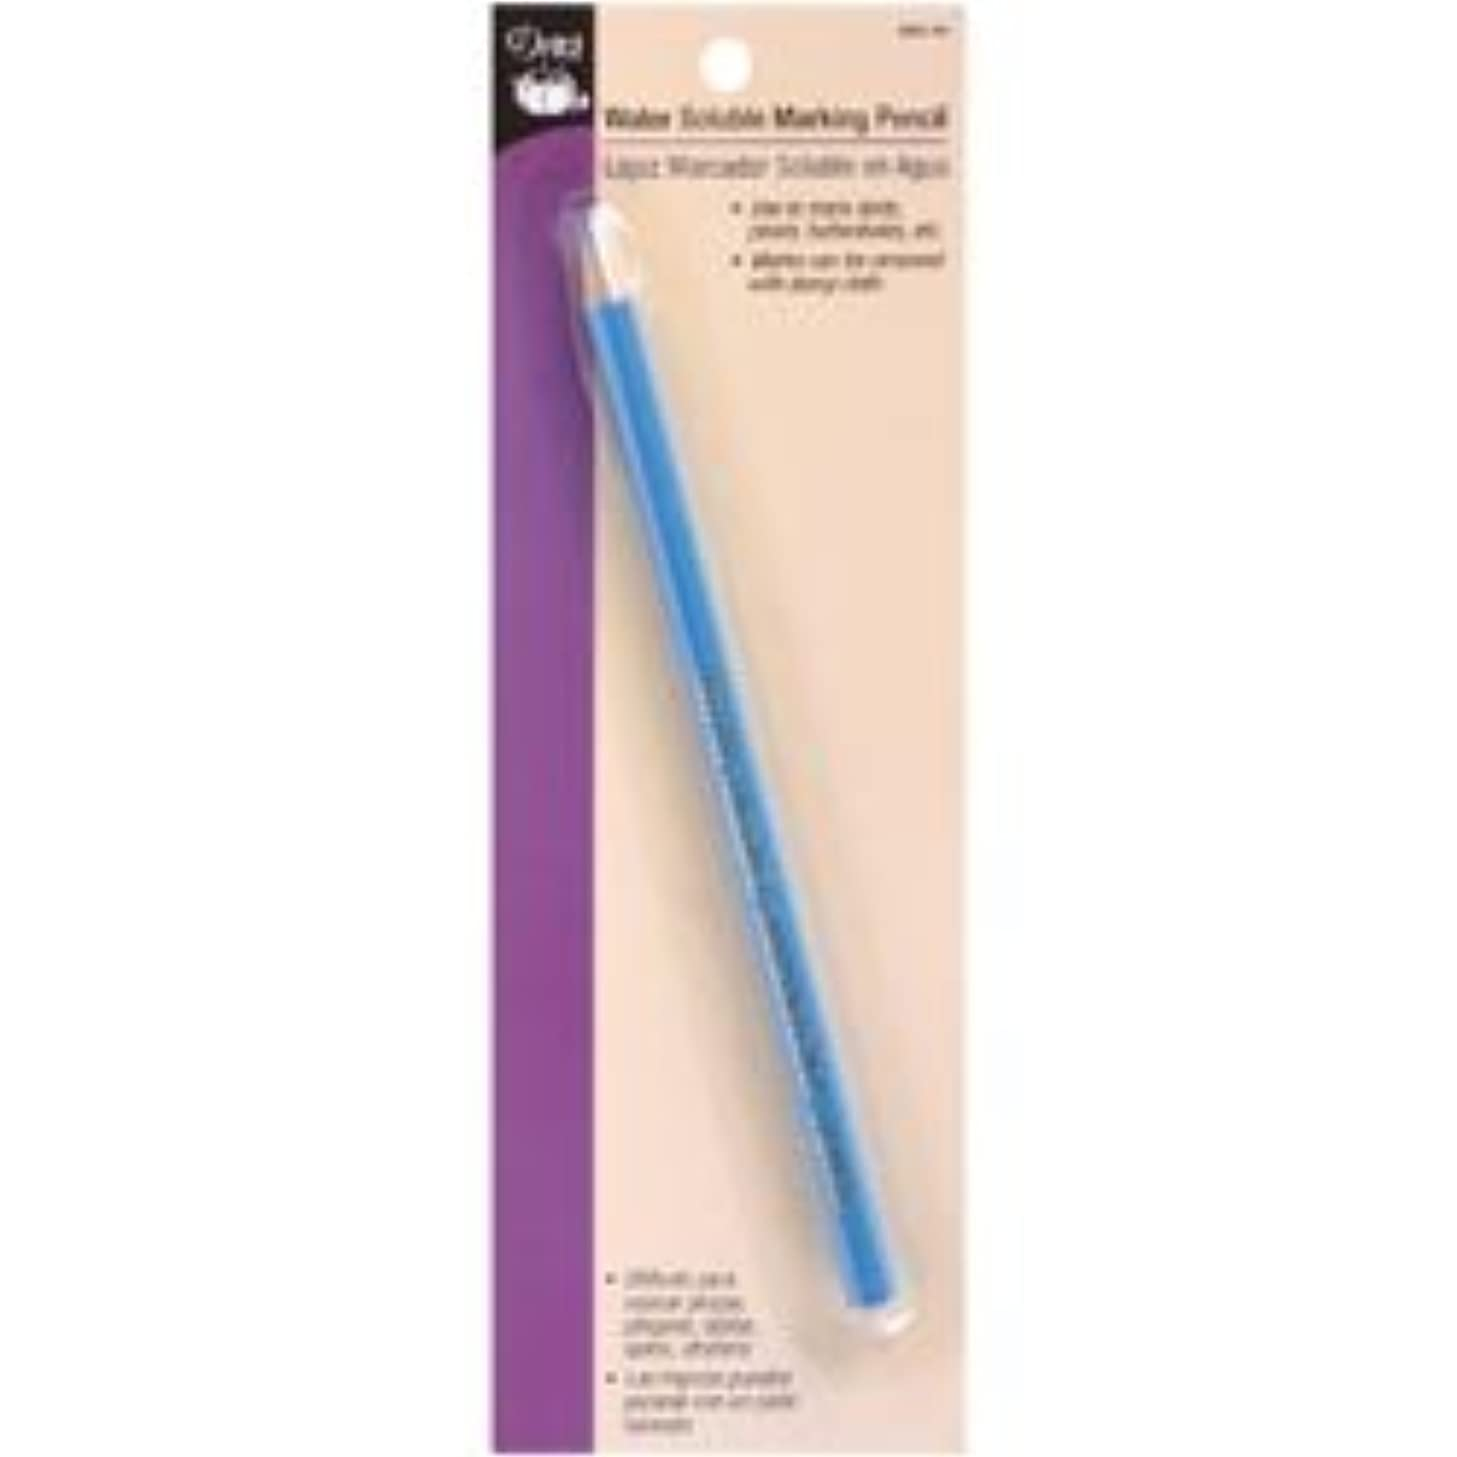 Bulk Buy: Dritz (6-Pack) Water Soluble Marking Pencil Light Blue 683-15